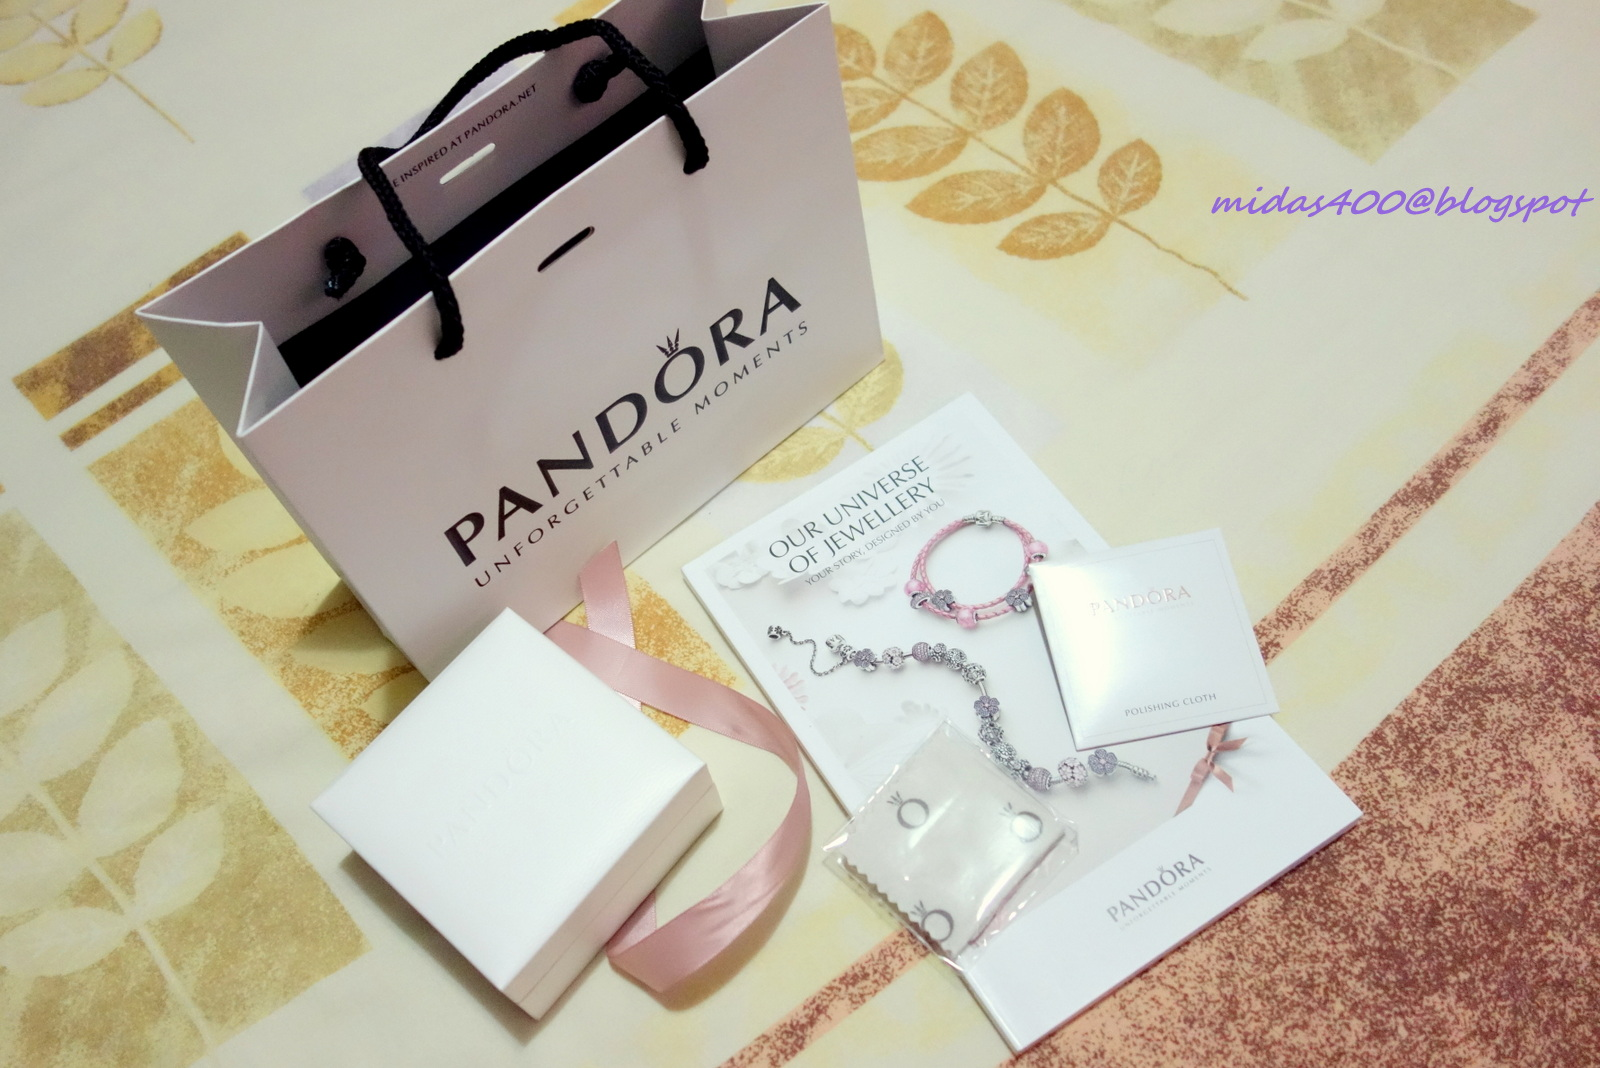 Midas Food n Travel Blog: Welcome to PANDORA Club!!